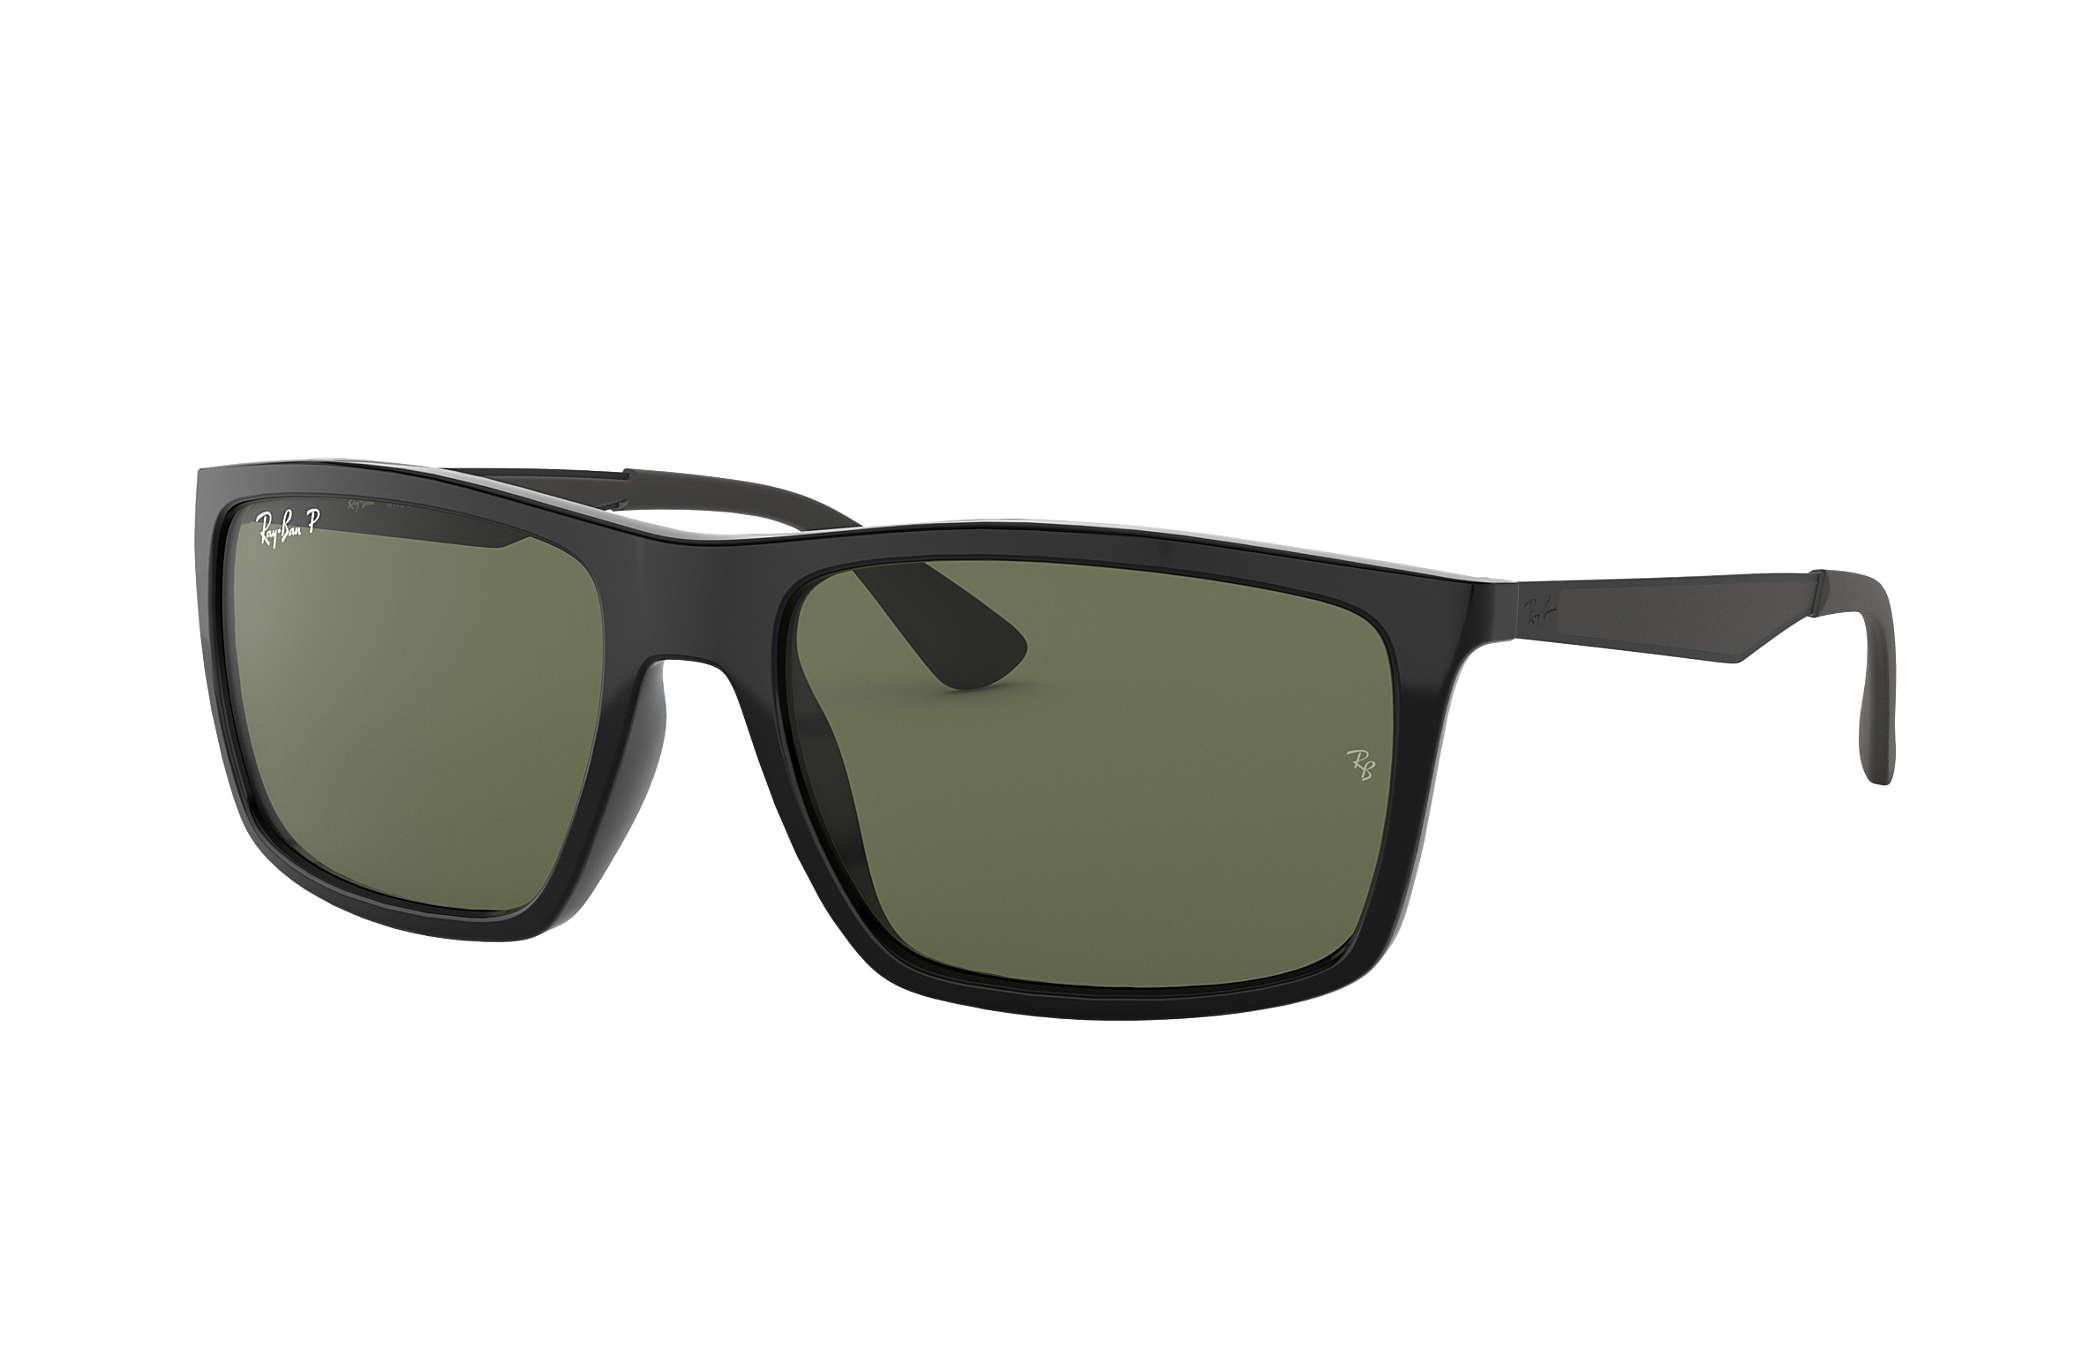 1fbd8441da Ray-Ban RB4228 Black - Nylon - Green Polarized Lenses - 0RB4228601 ...